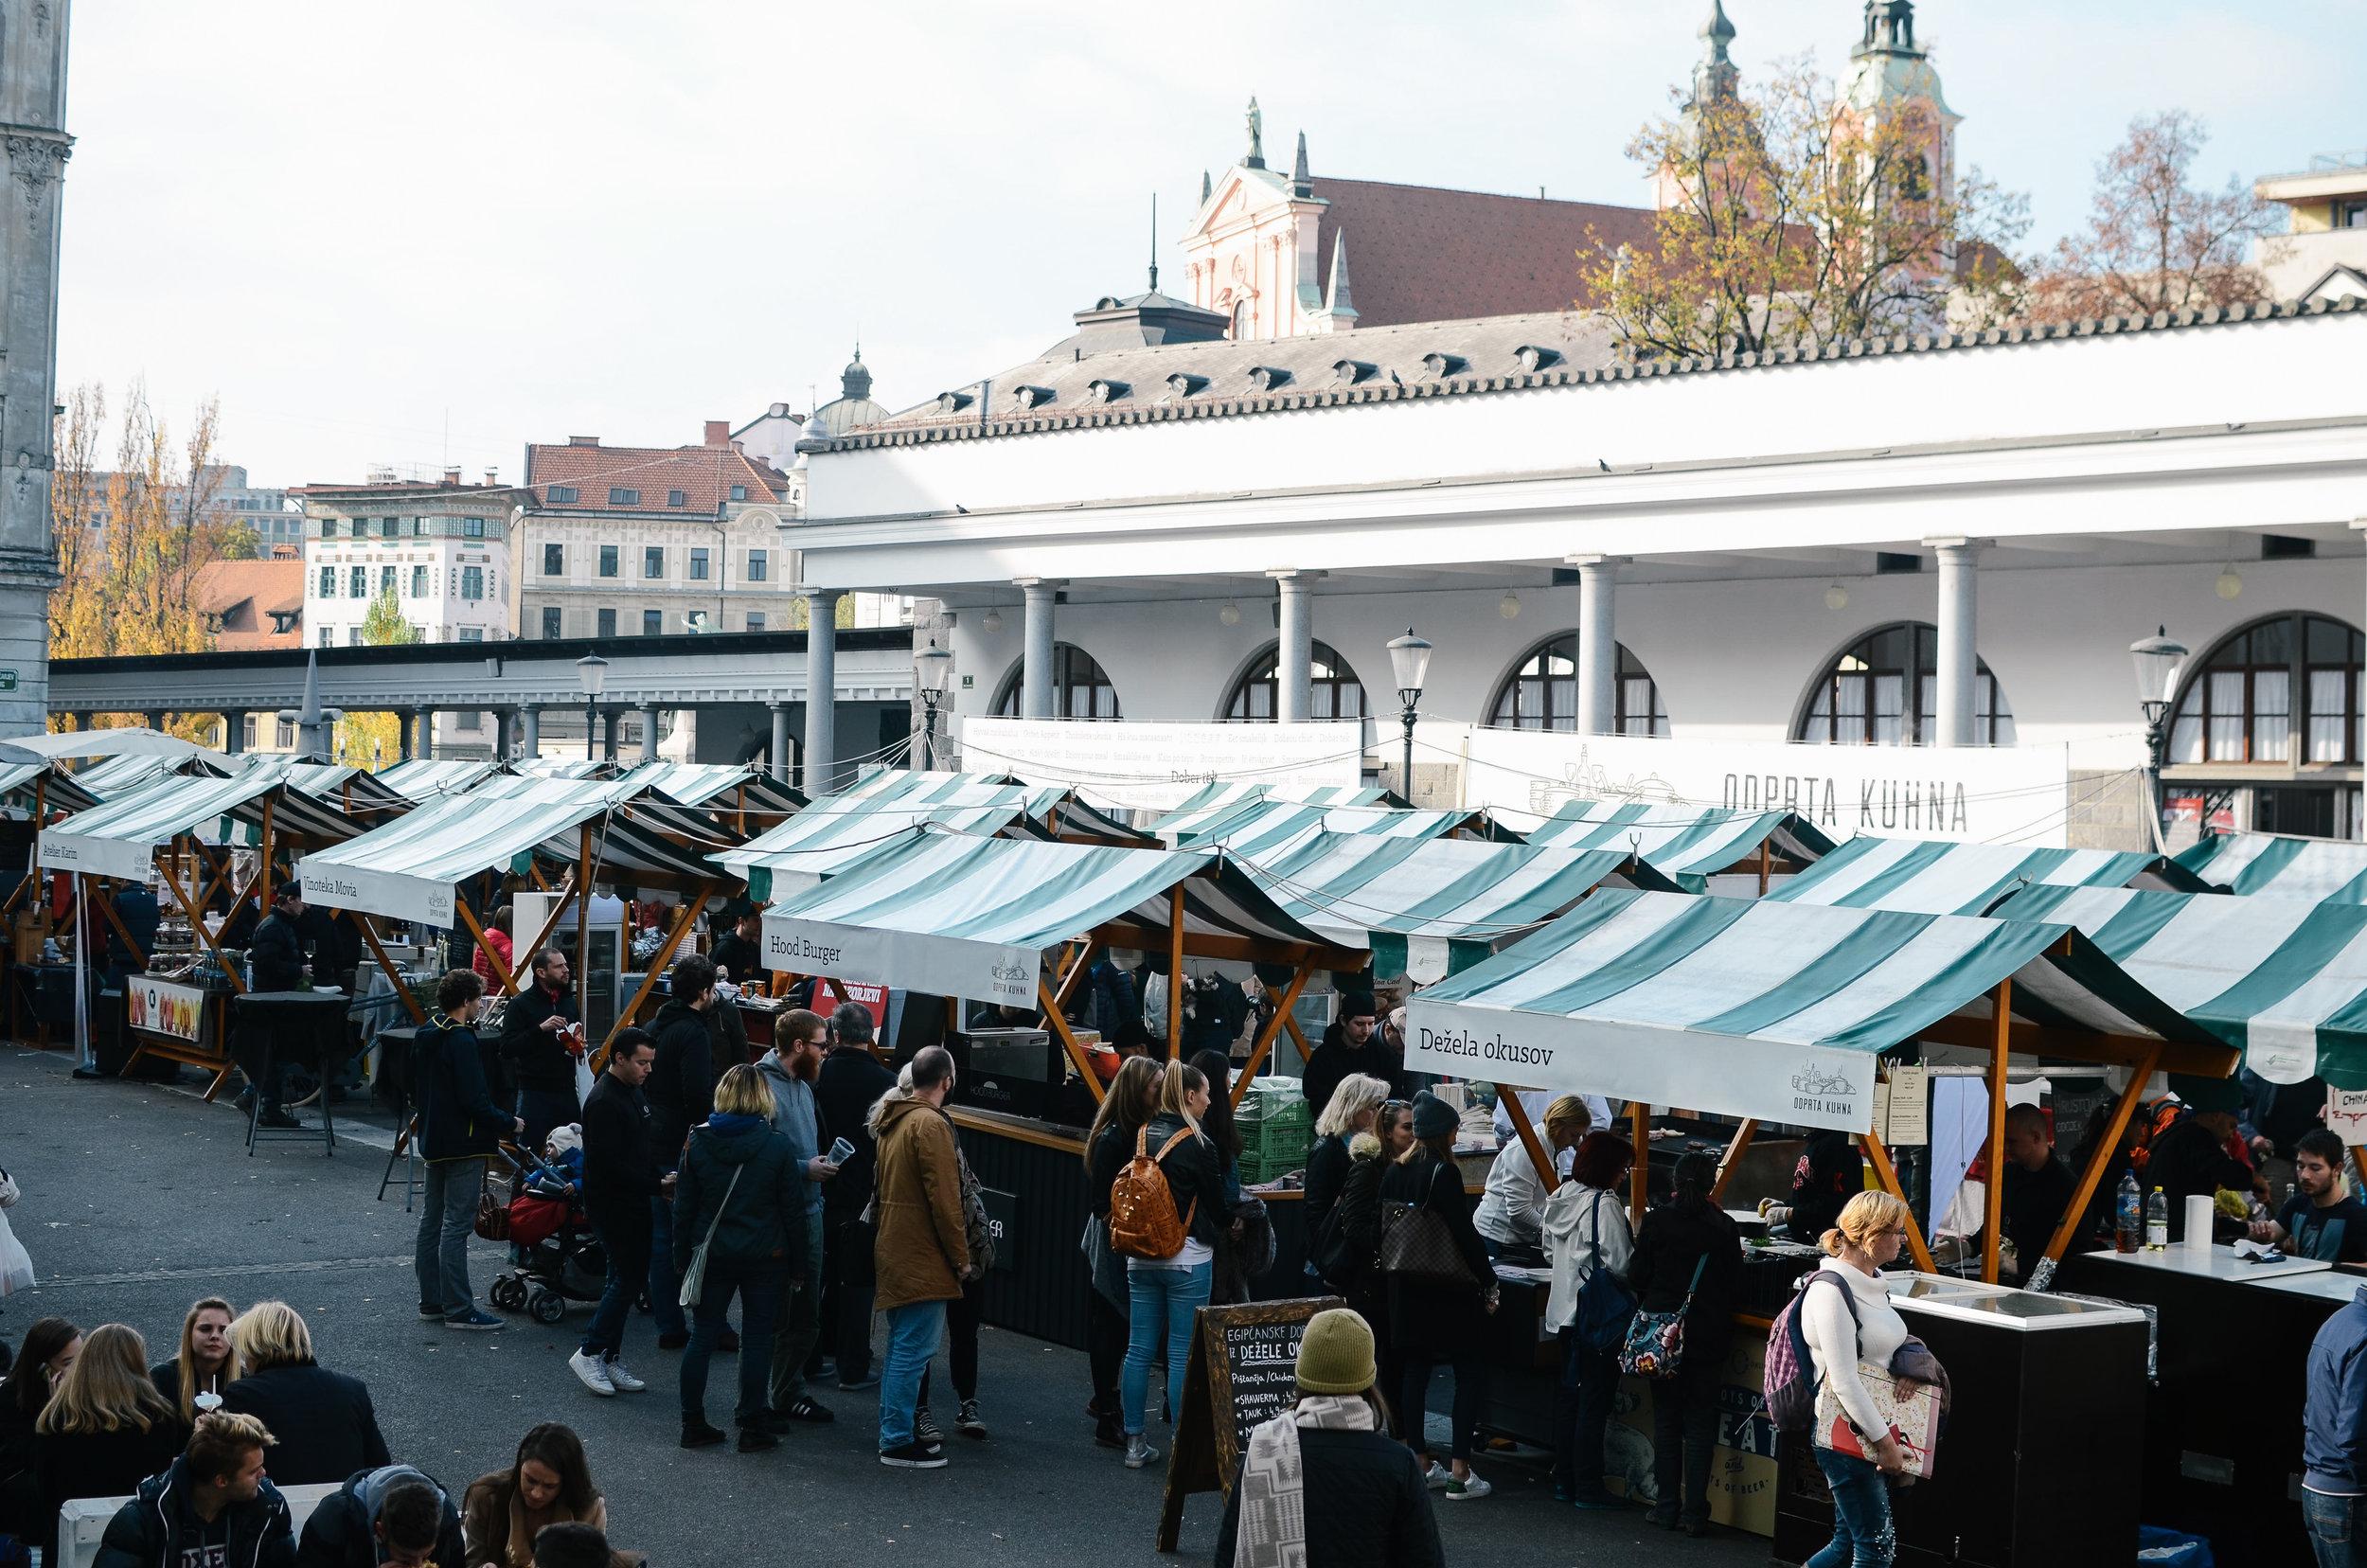 ljubljana-slovenia-travel-guide-lifeonpine_DSC_2065.jpg